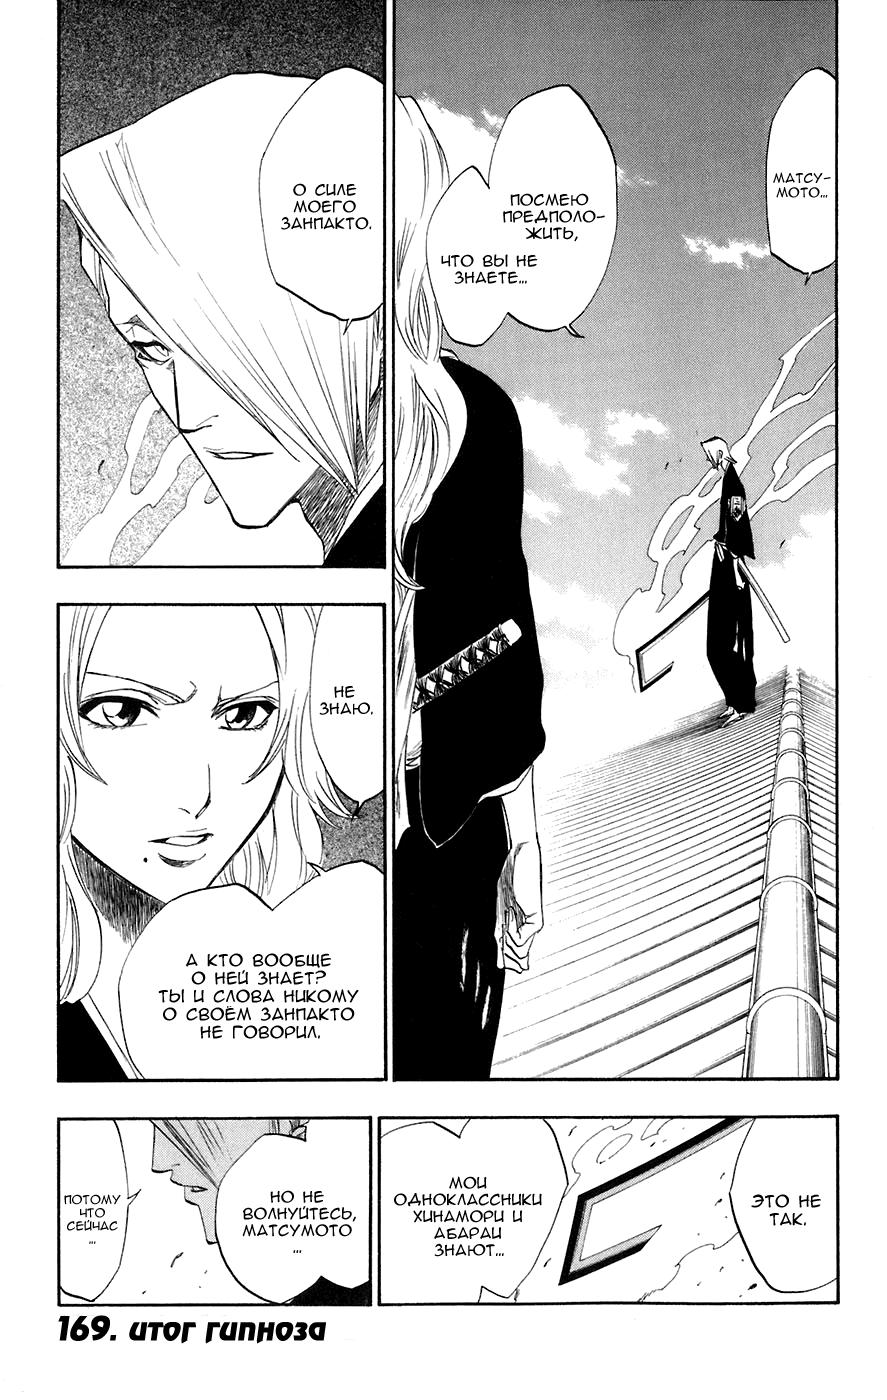 Манга Bleach / Блич Манга Bleach Глава # 169 - Итог гипноза, страница 1